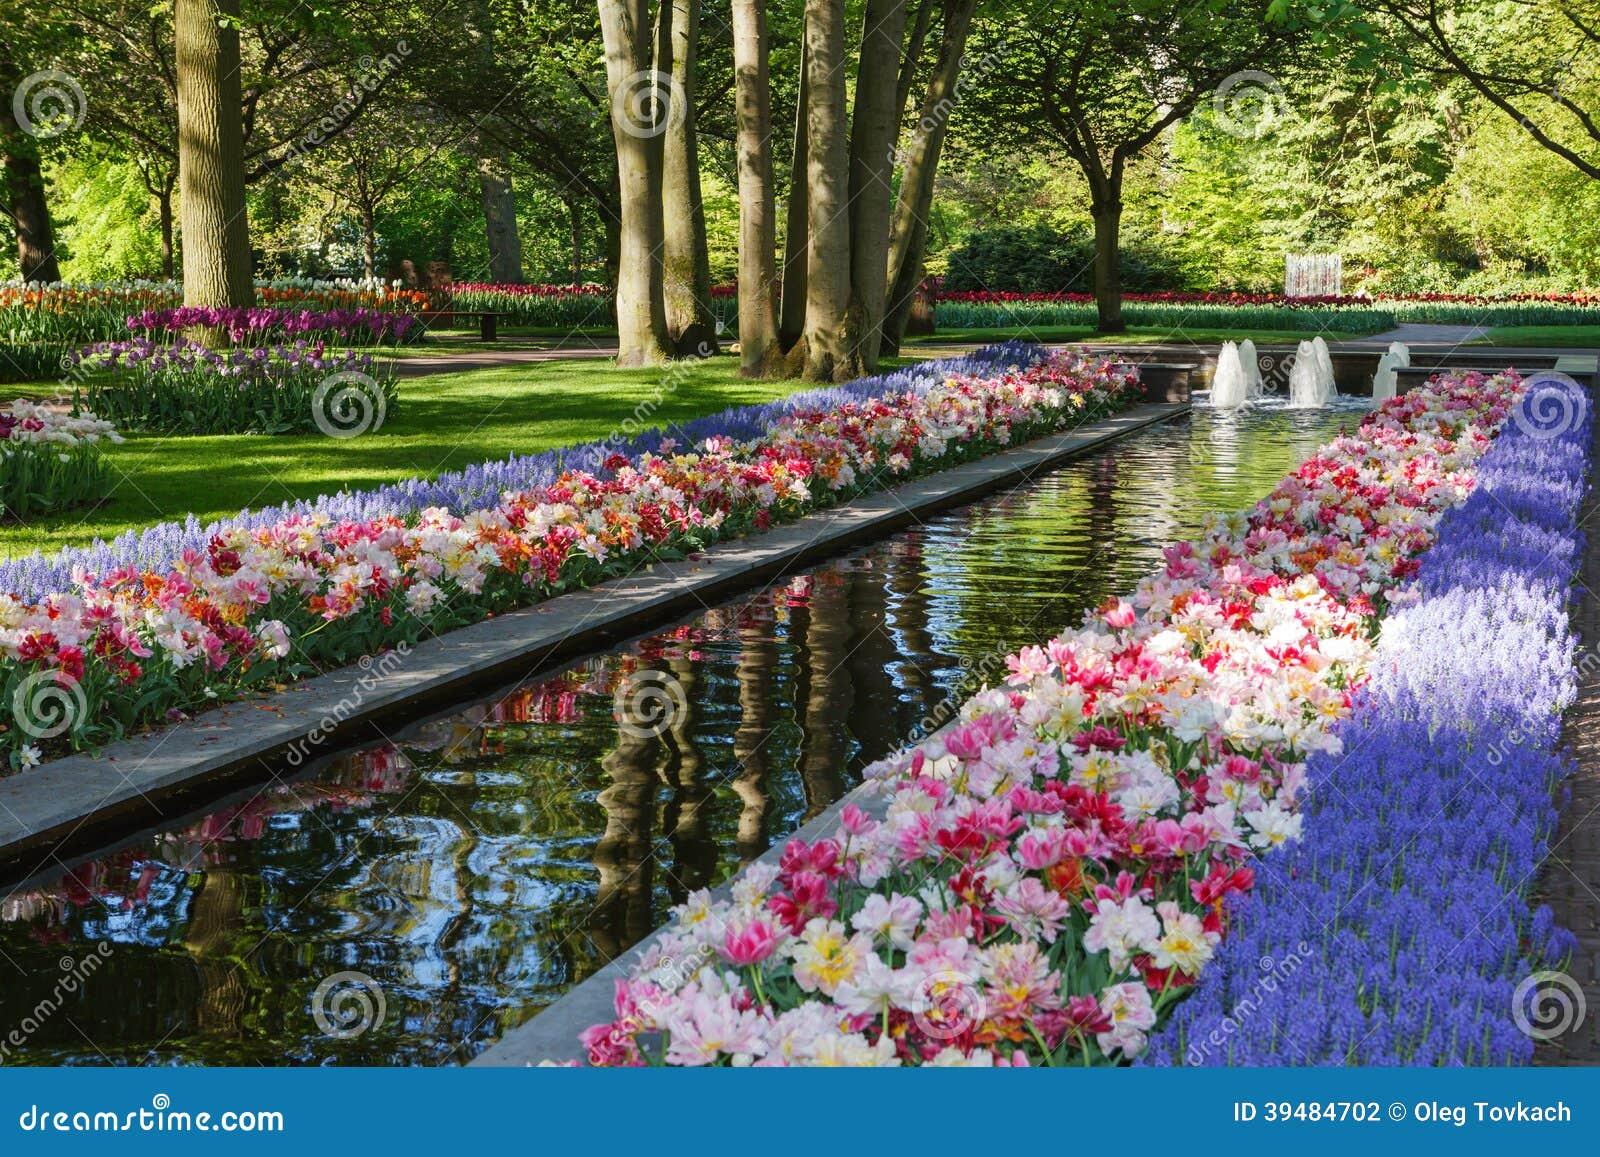 Keukenhof Largest Flower Garden In Europe Holland Stock Photo